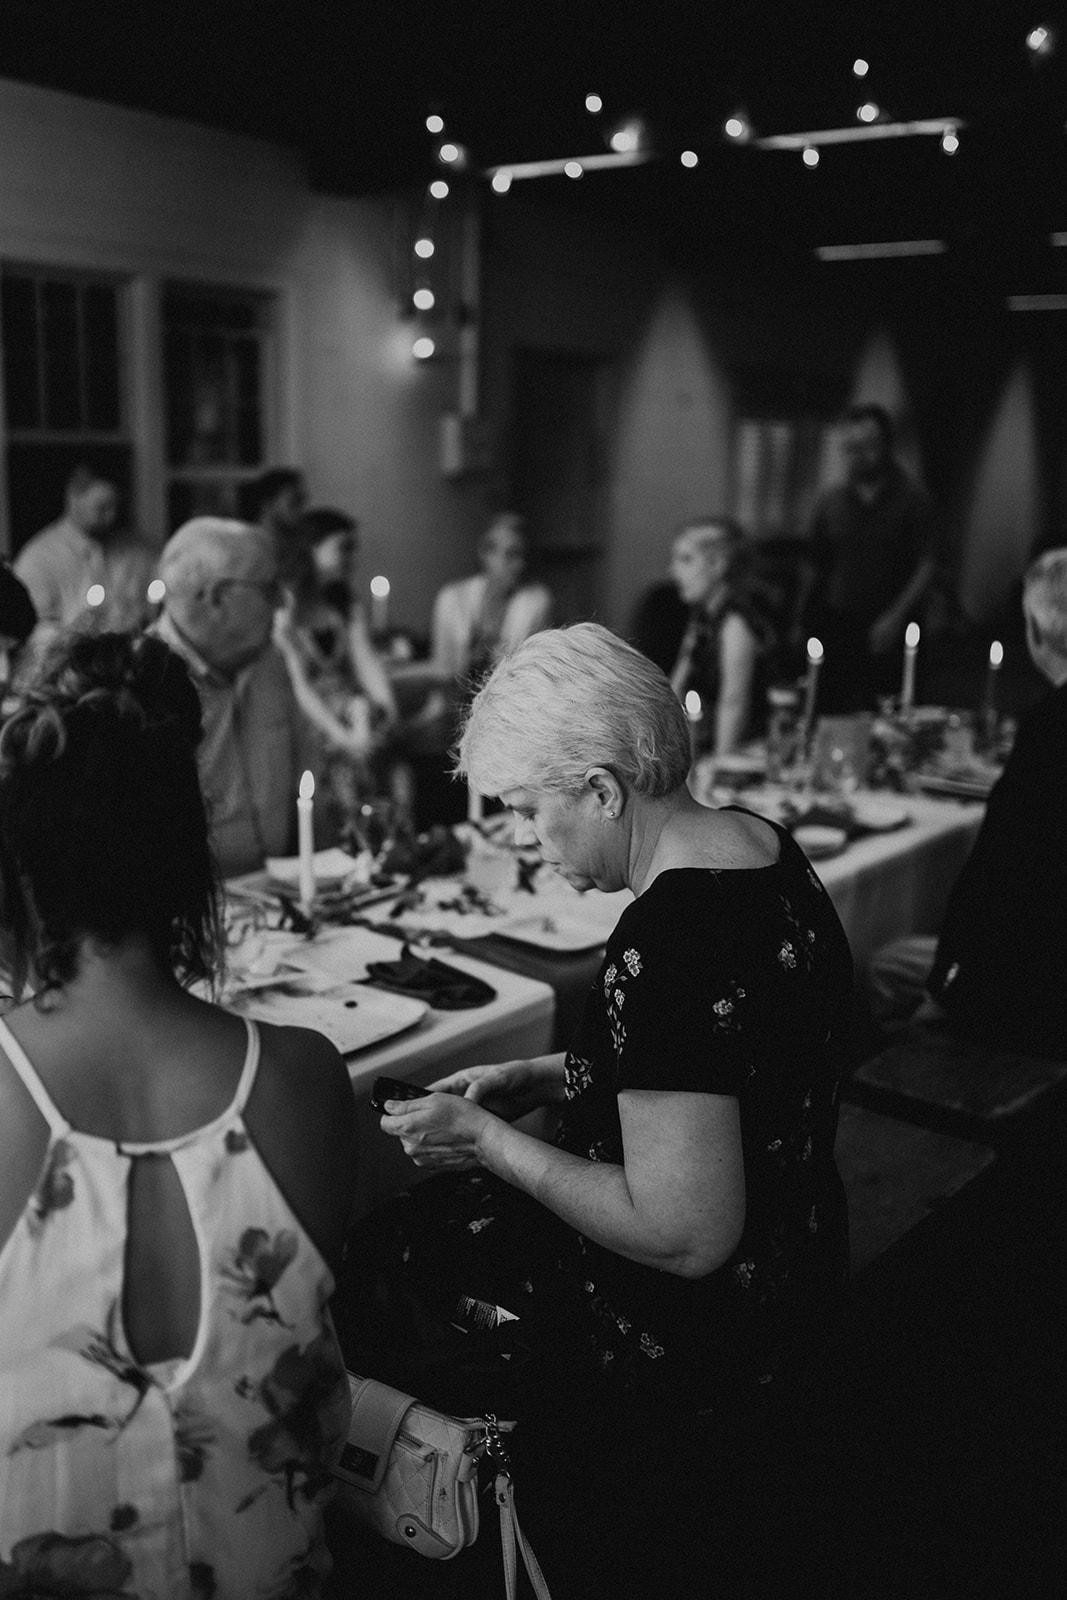 camp_wokanda_peoria_illinois_wedding_photographer_wright_photographs_bliese_0927.jpg